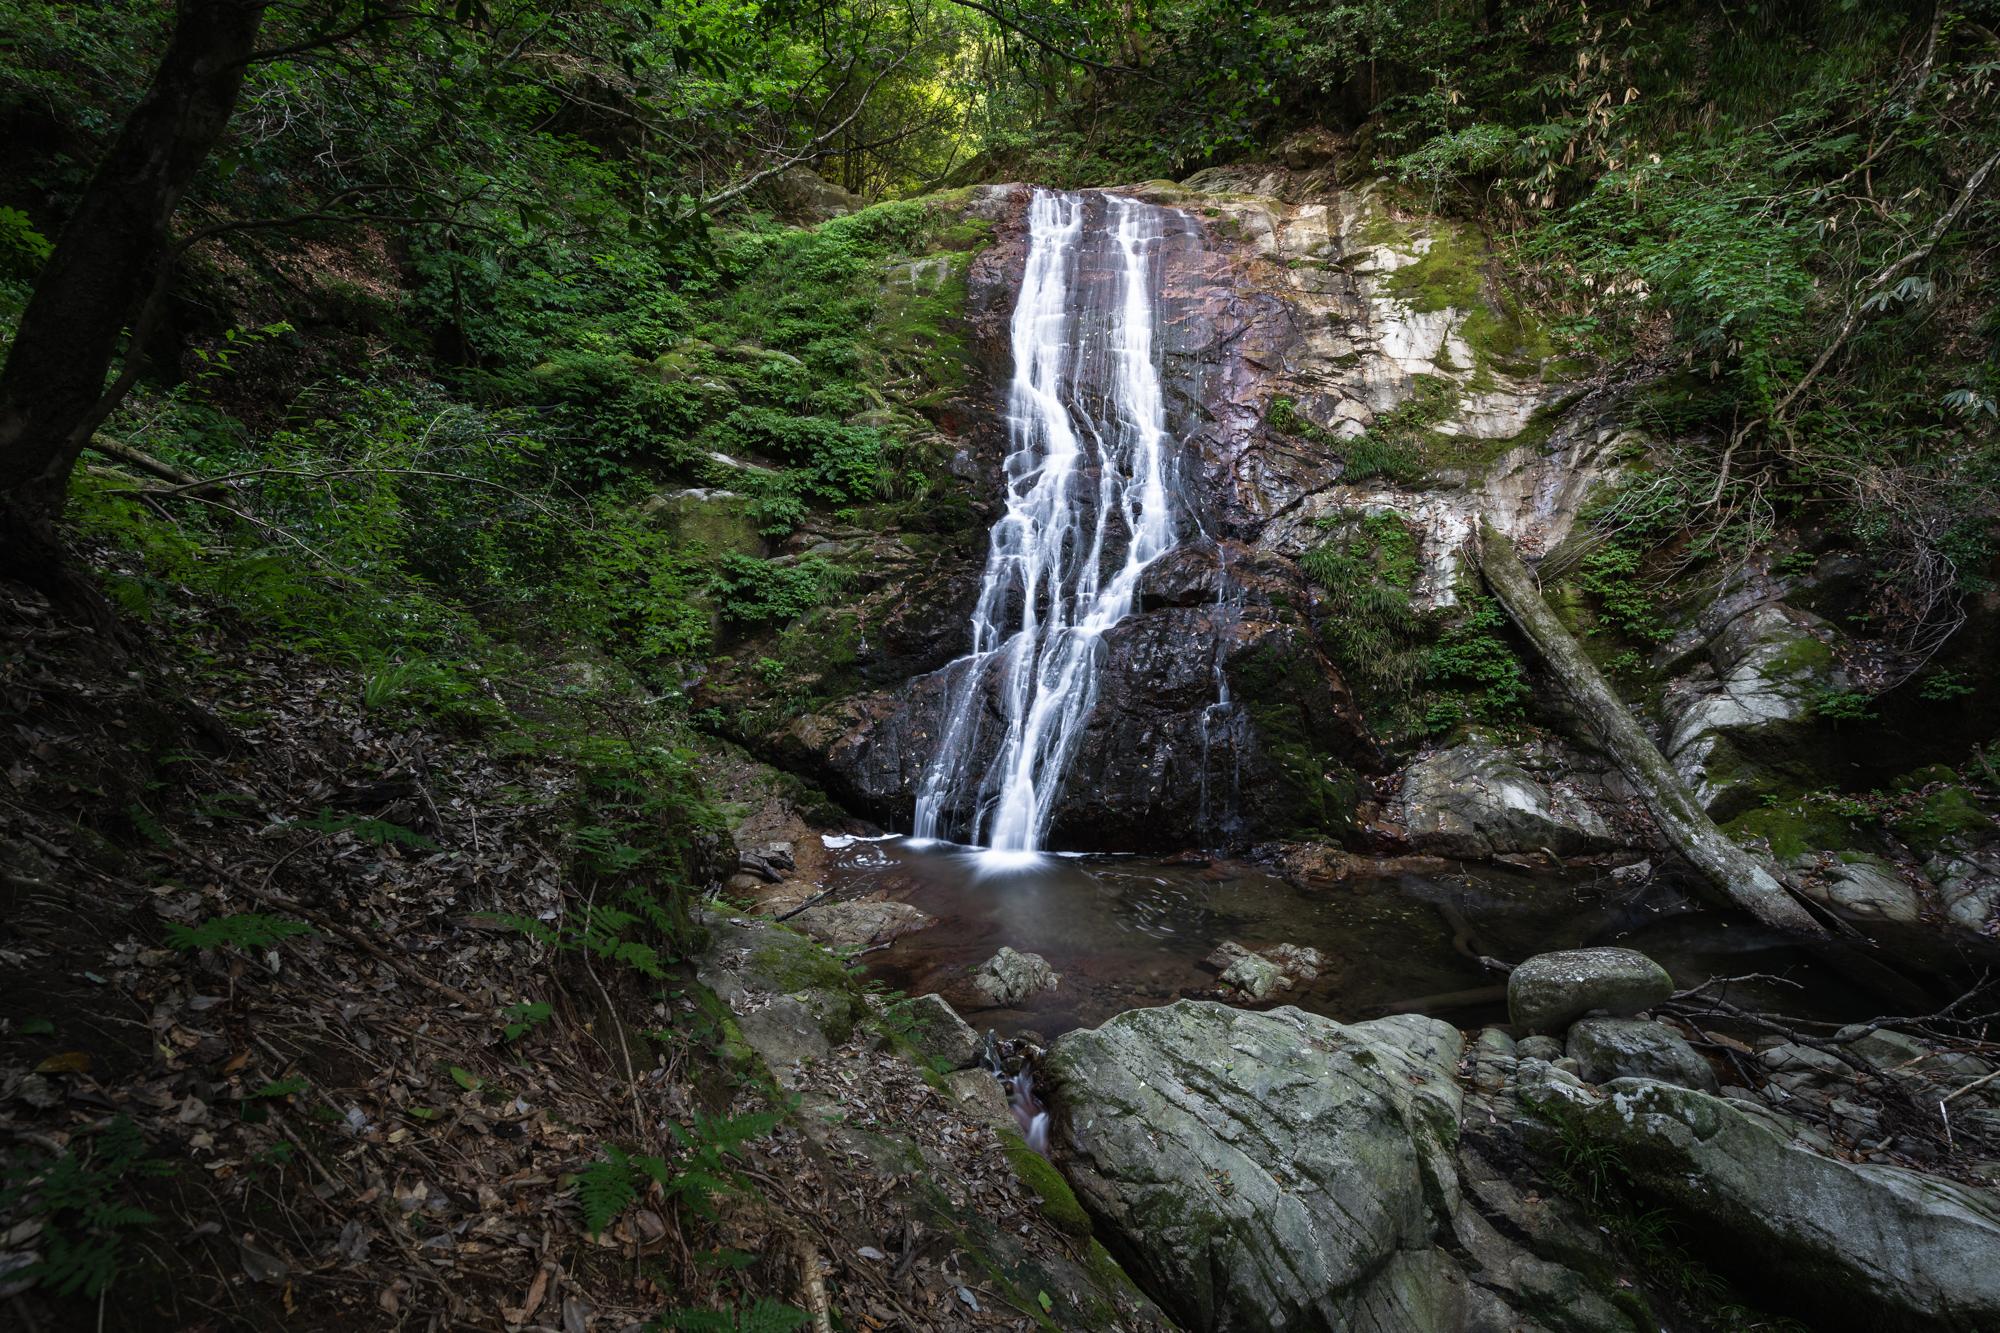 DSC01624 兵庫県   清竜の滝 ( 駐車場から歩いて5分! 関西・近畿・兵庫県の滝スポット! アクセス情報や撮影ポイントなど!)